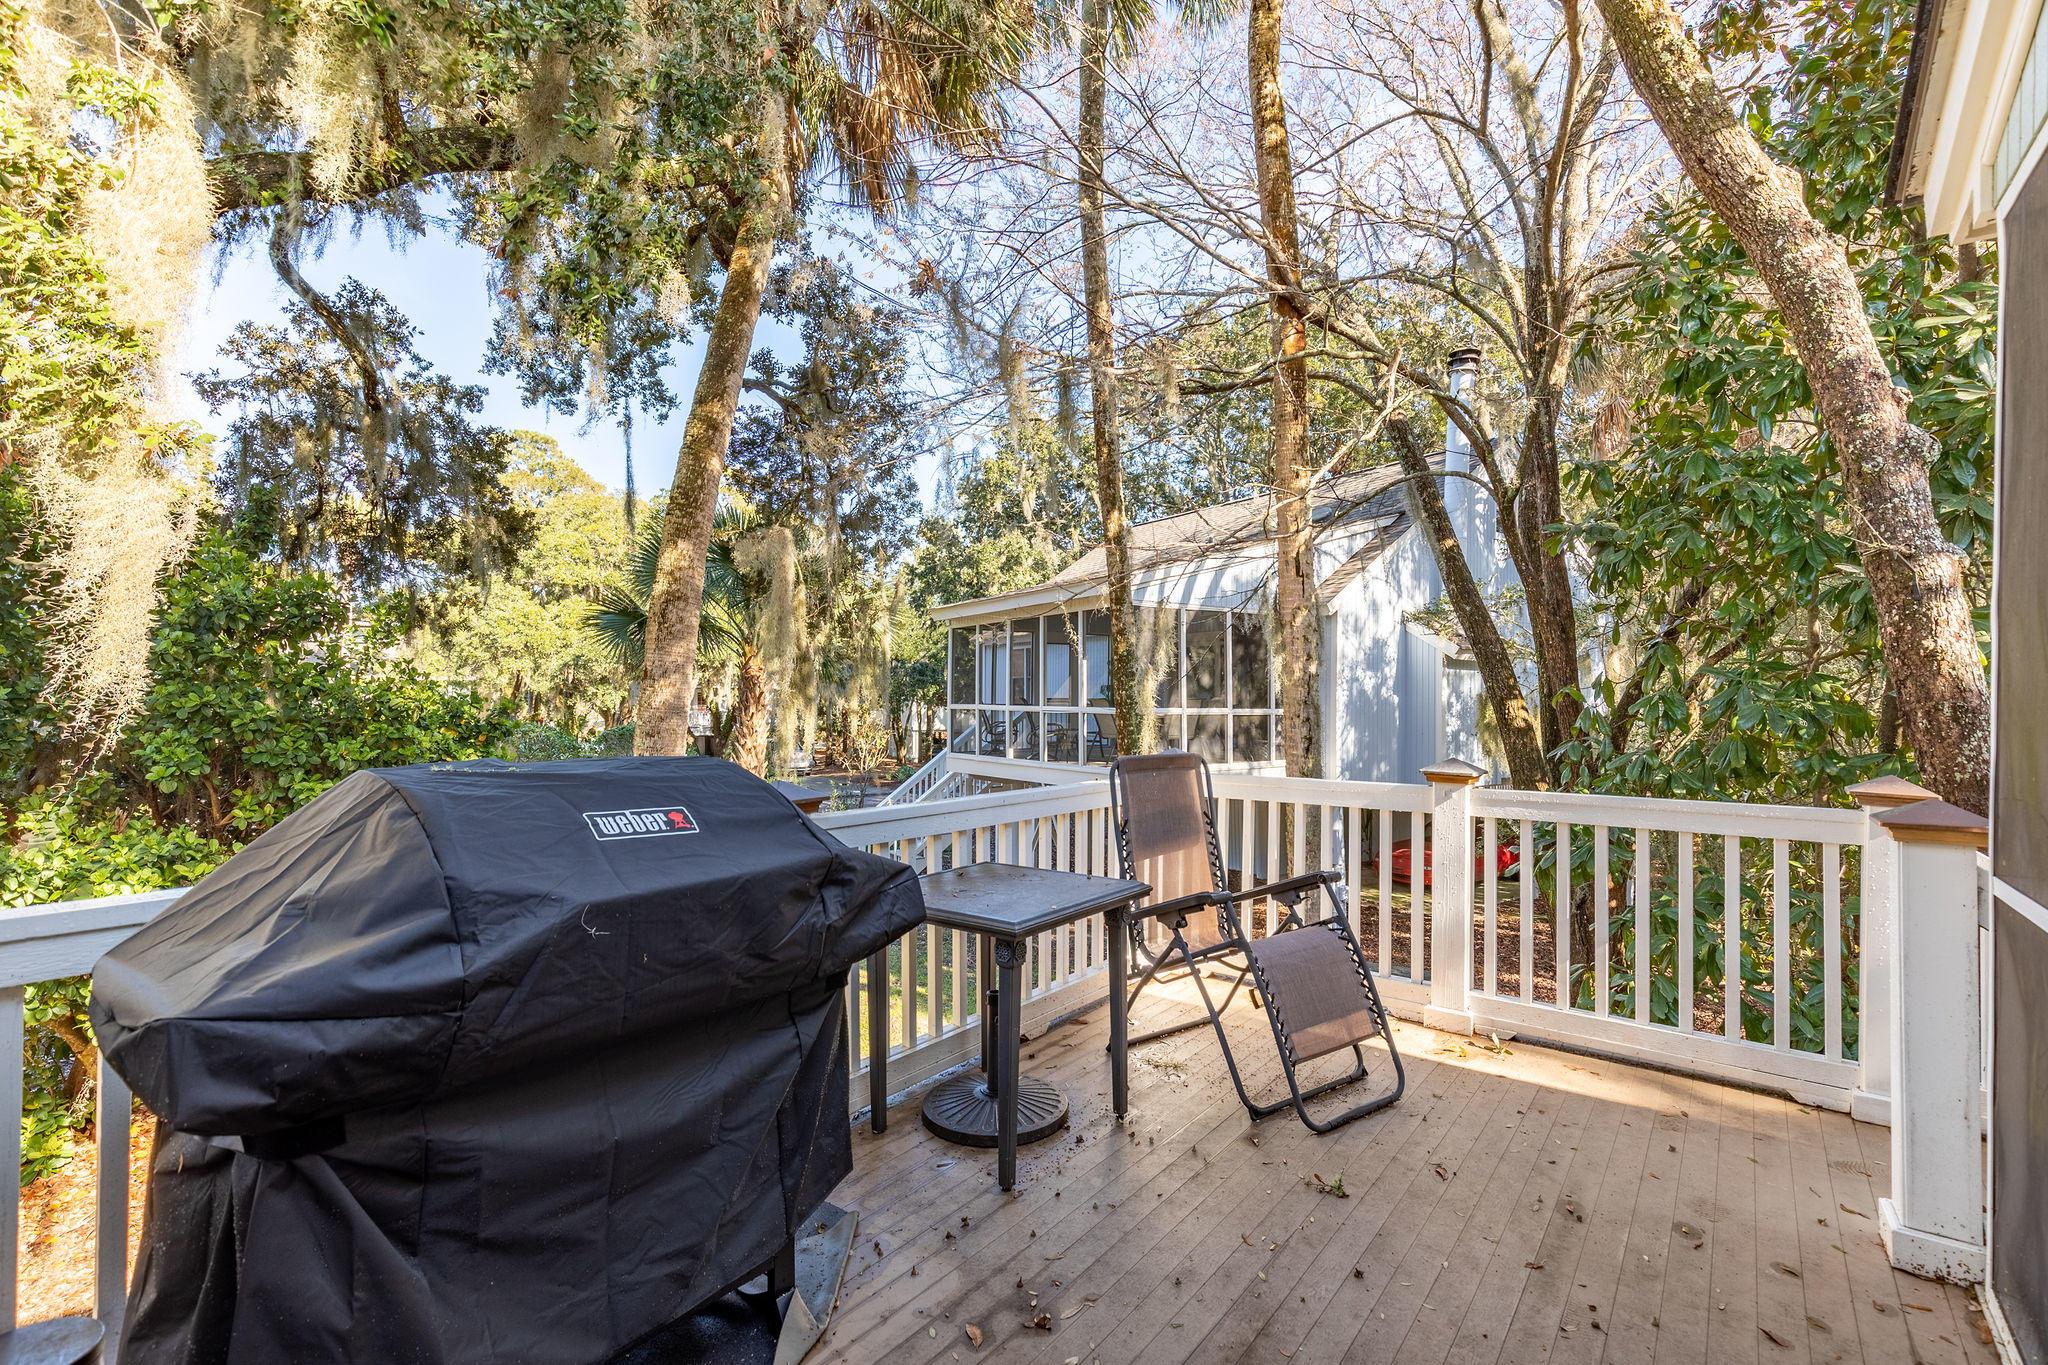 Seabrook Island Homes For Sale - 515 Cobby Creek, Seabrook Island, SC - 16